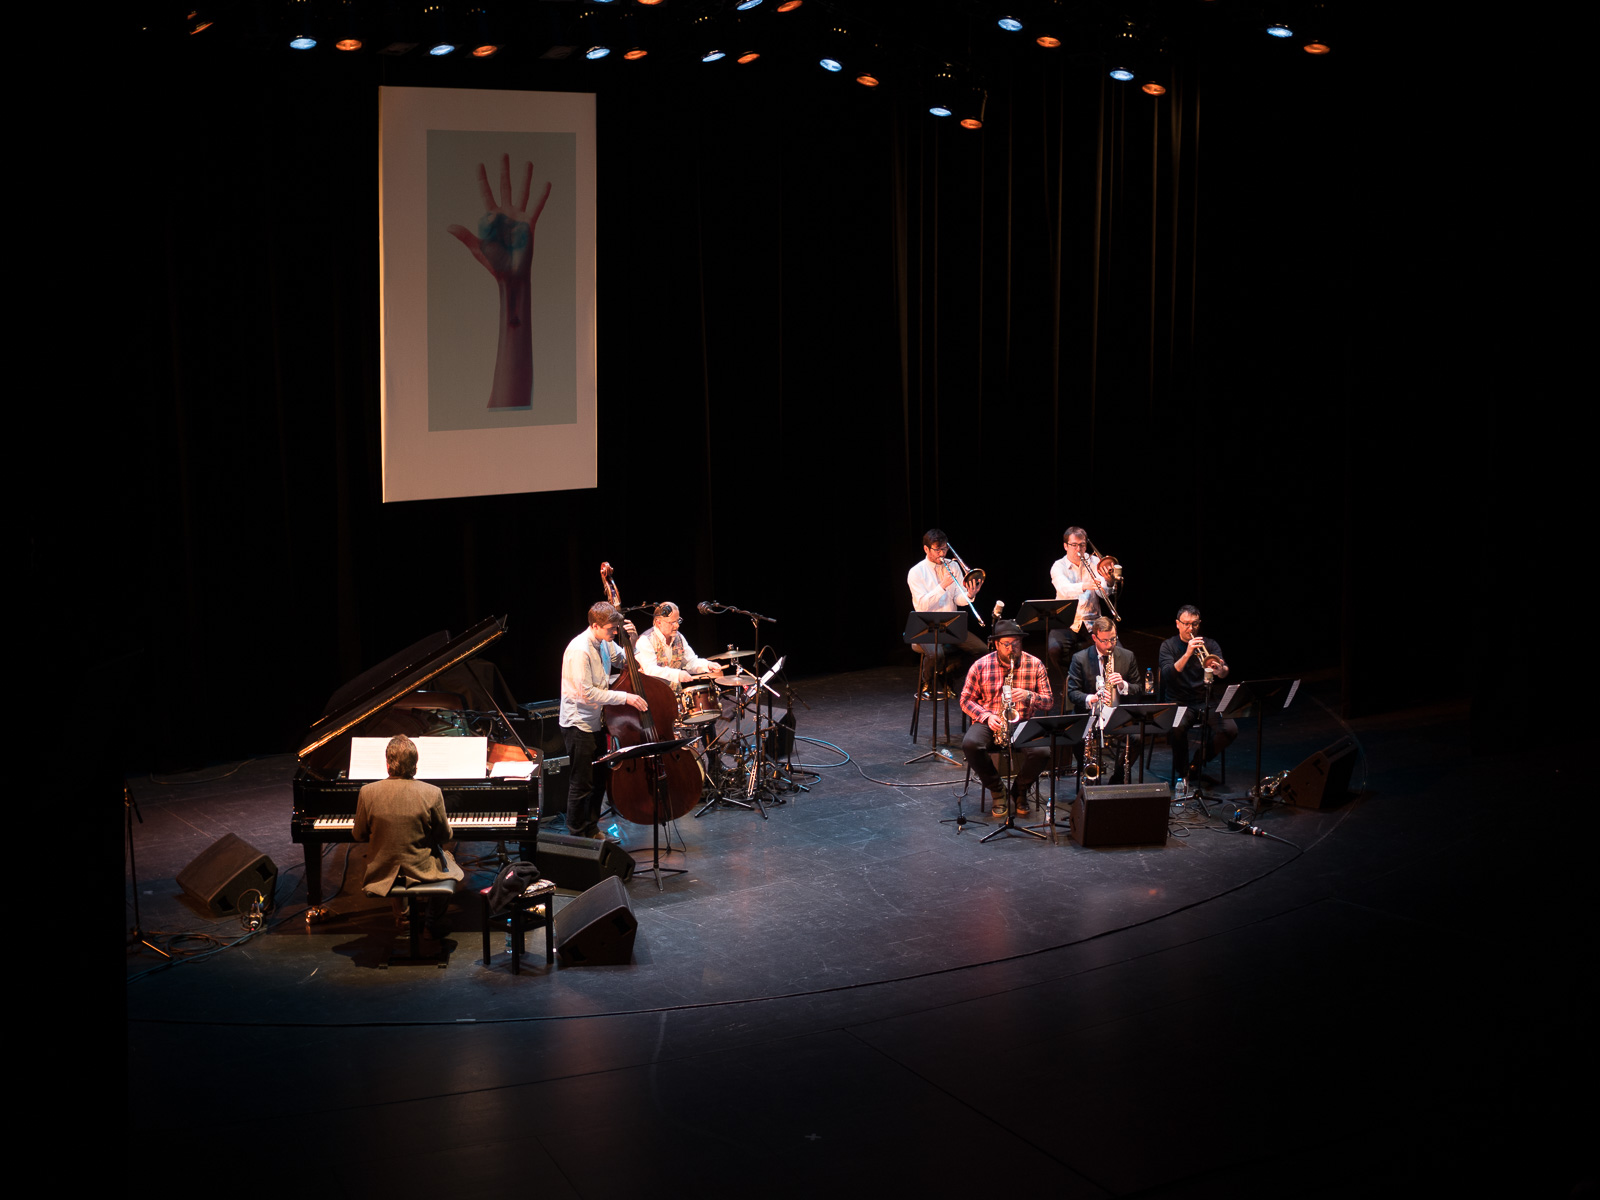 Keith Tippett Octet beim Jazzfest Berlin. Foto: Martin Hufner